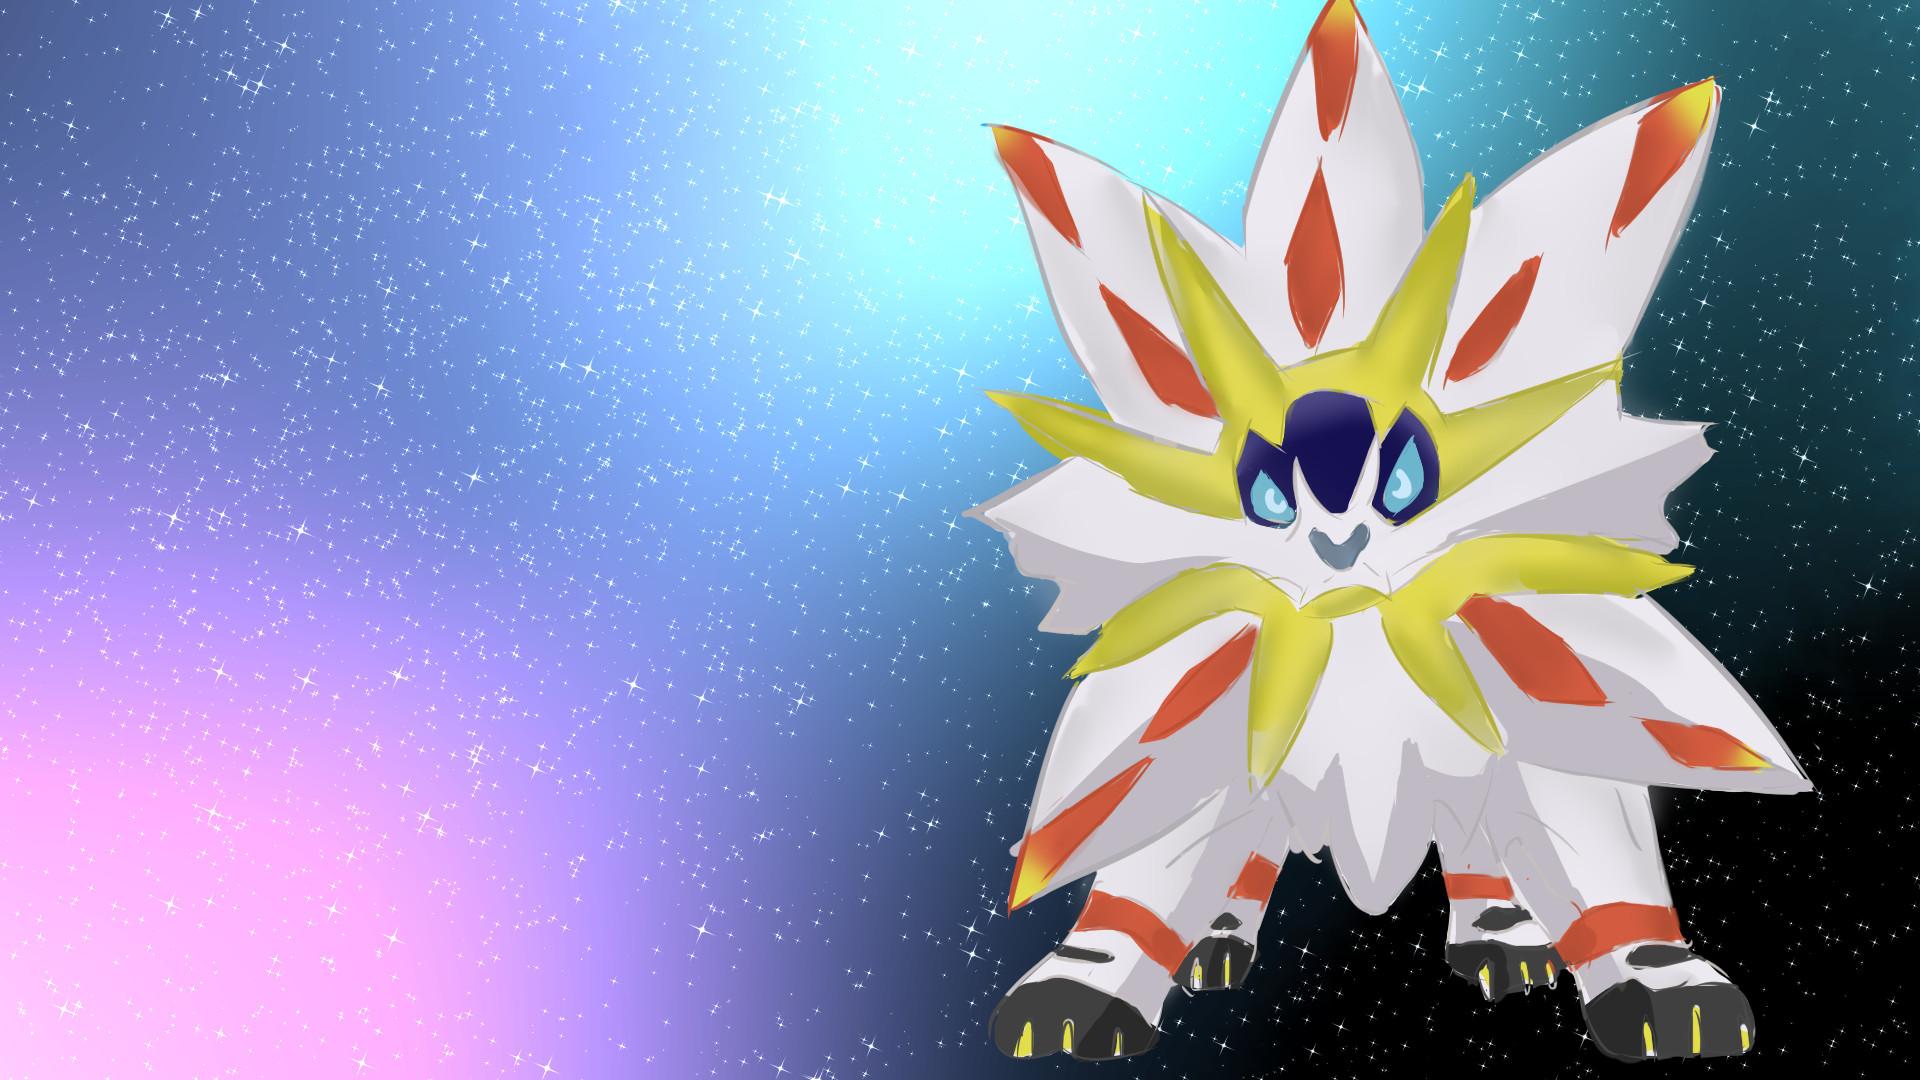 Pokemon Sun legendary by TombieFox Pokemon Sun legendary by TombieFox